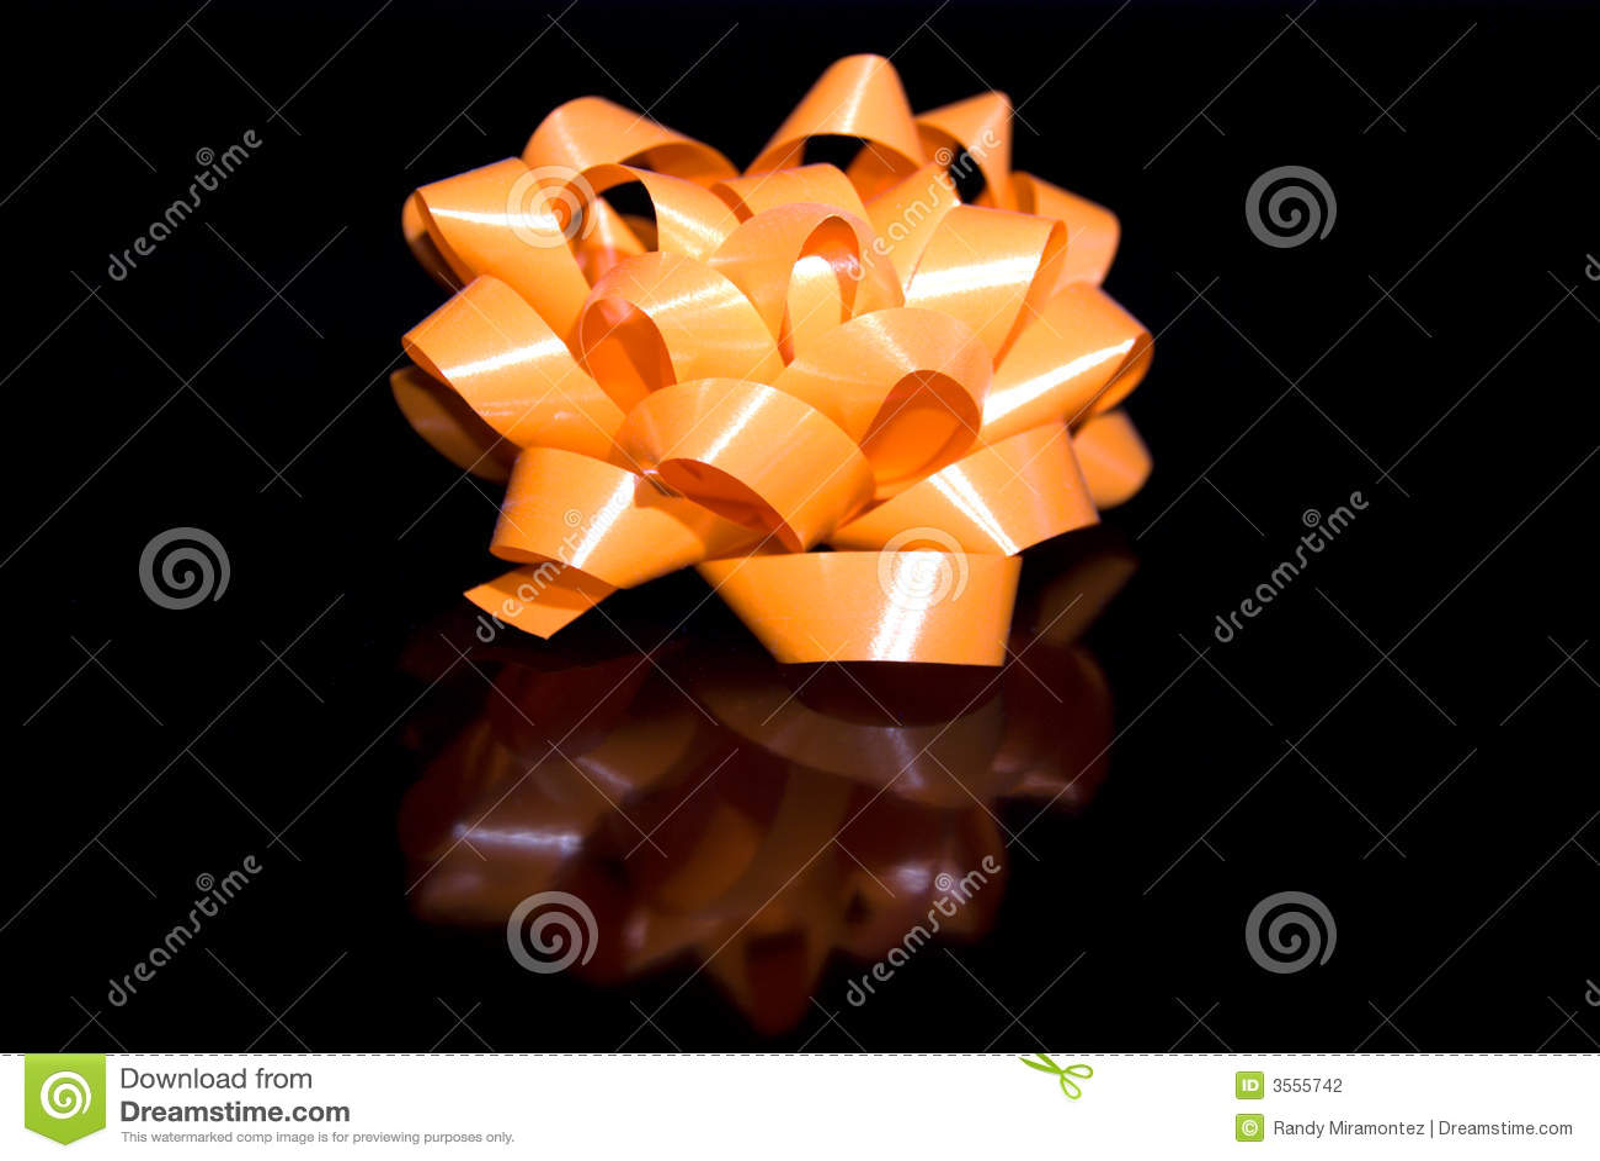 Arco arancione